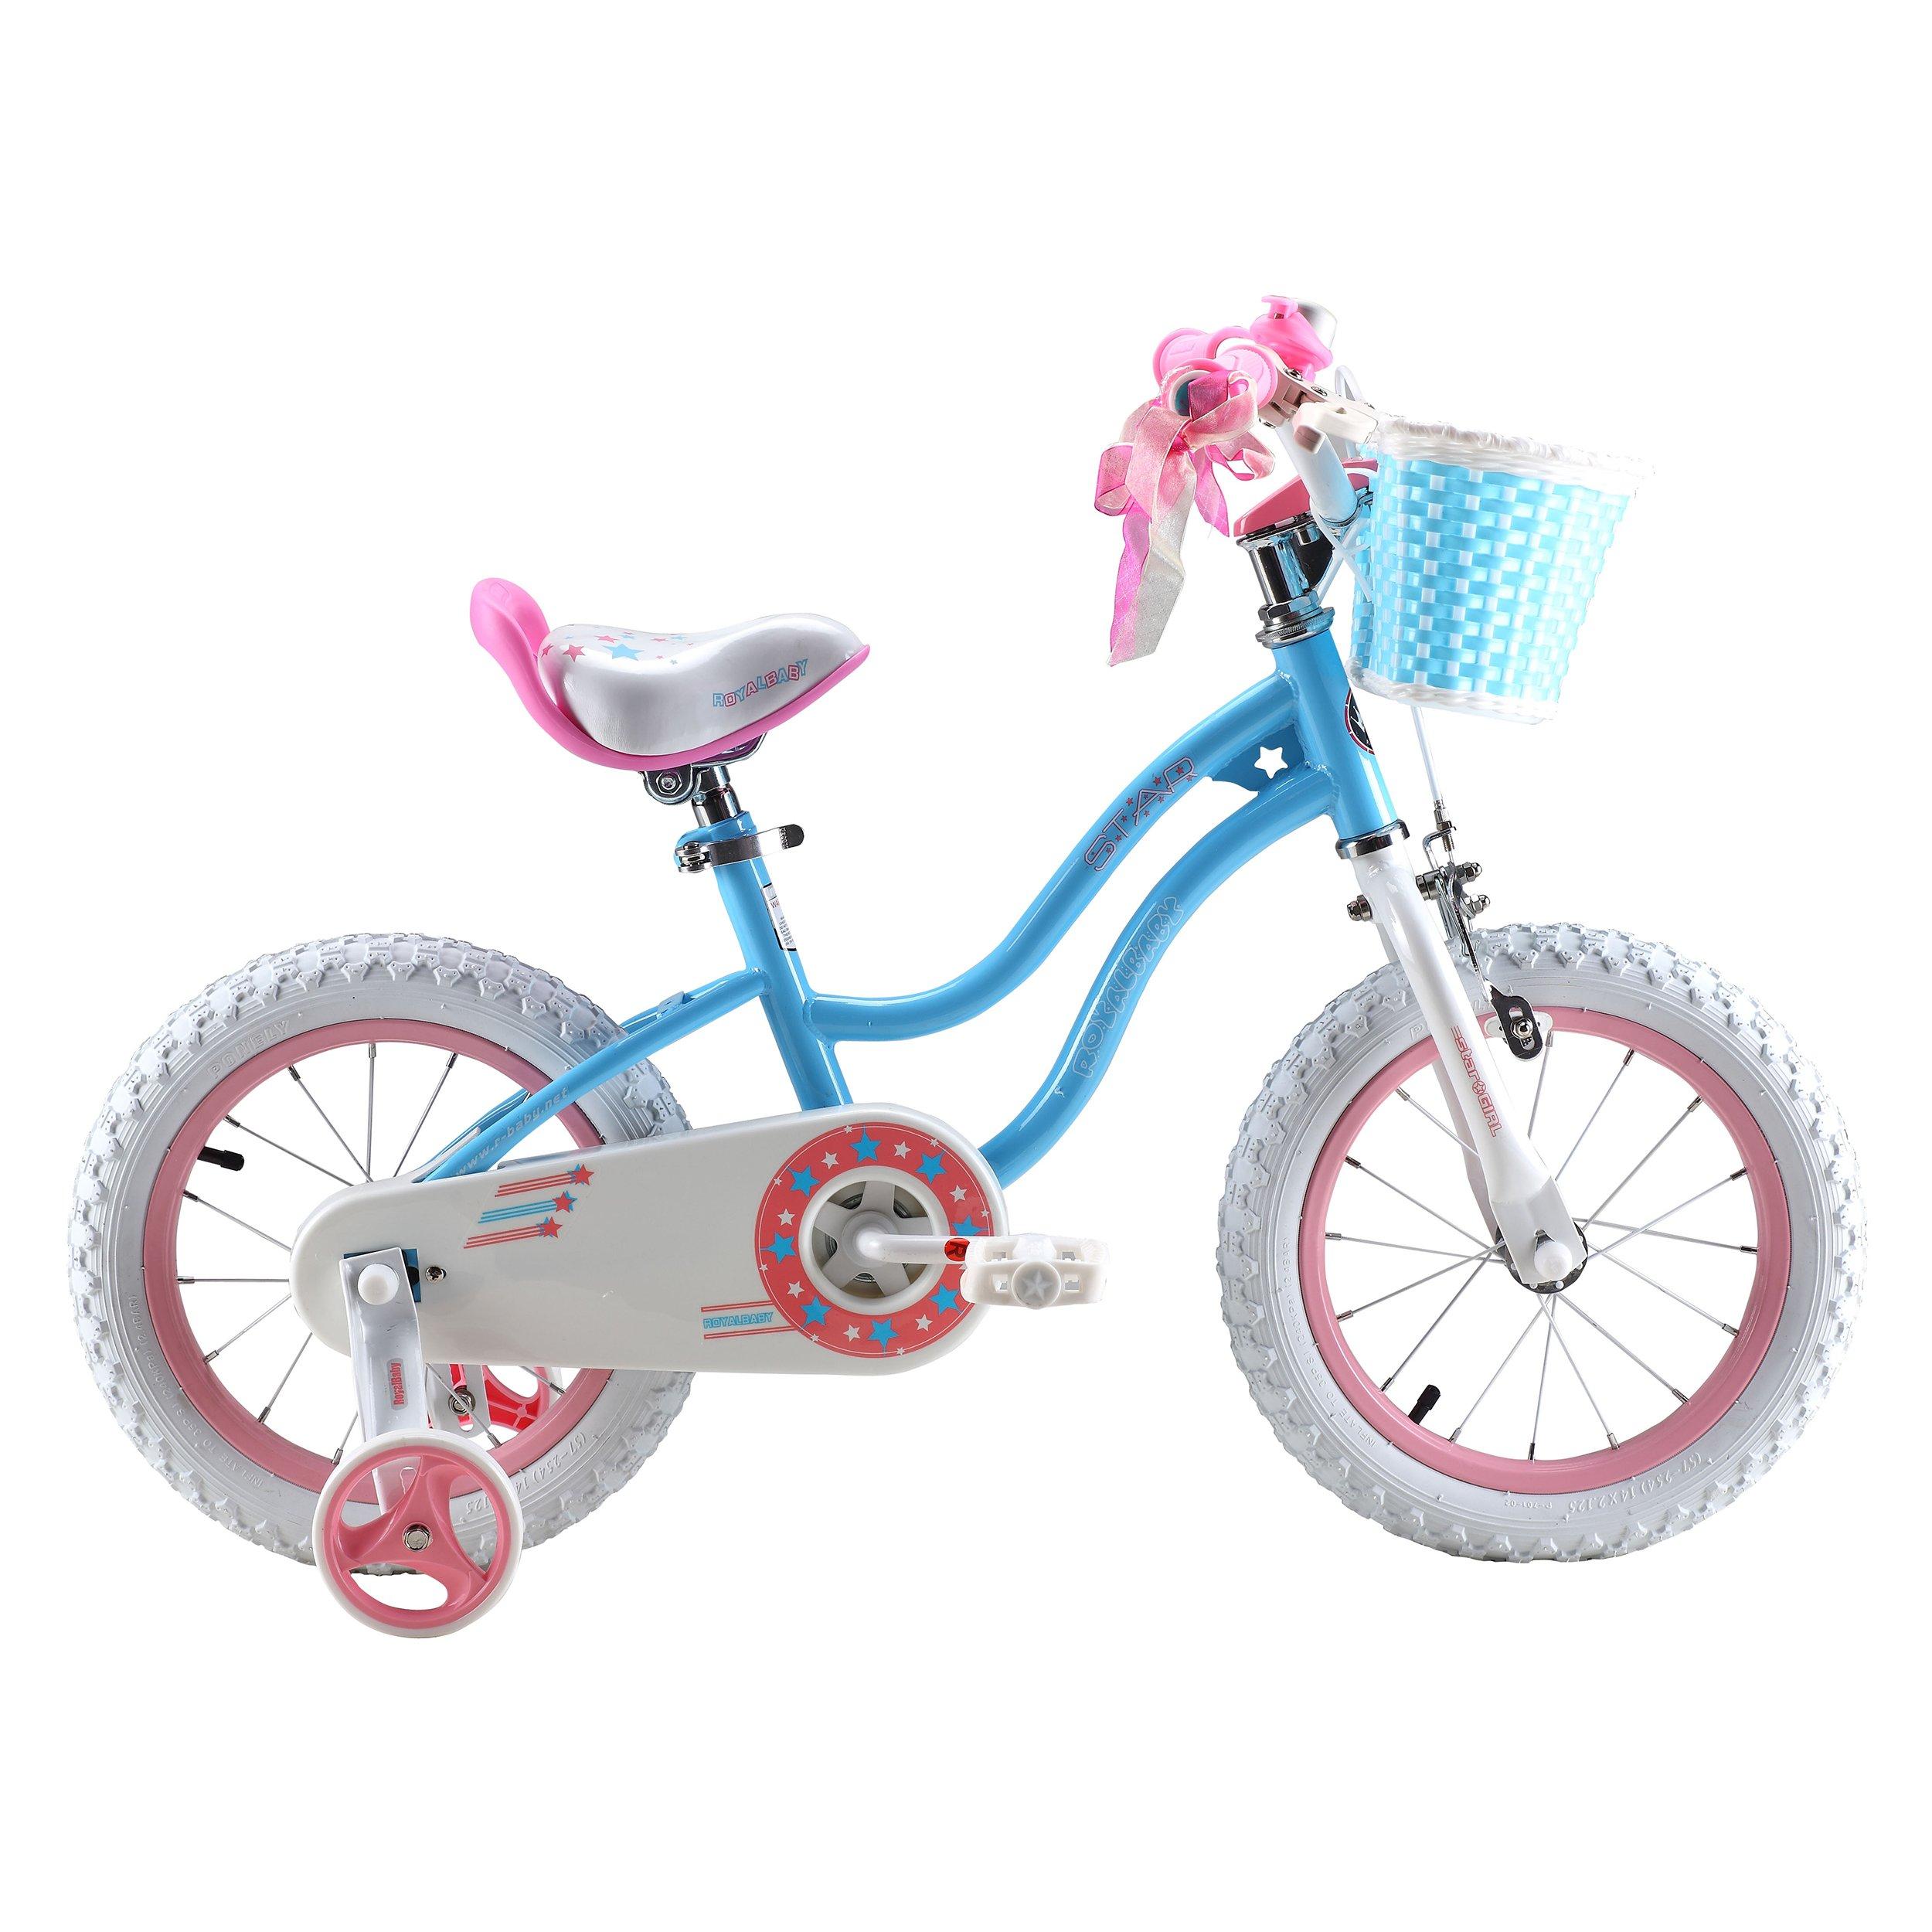 Royalbaby Stargirl Girl's Bike, 14 inch wheels, Blue